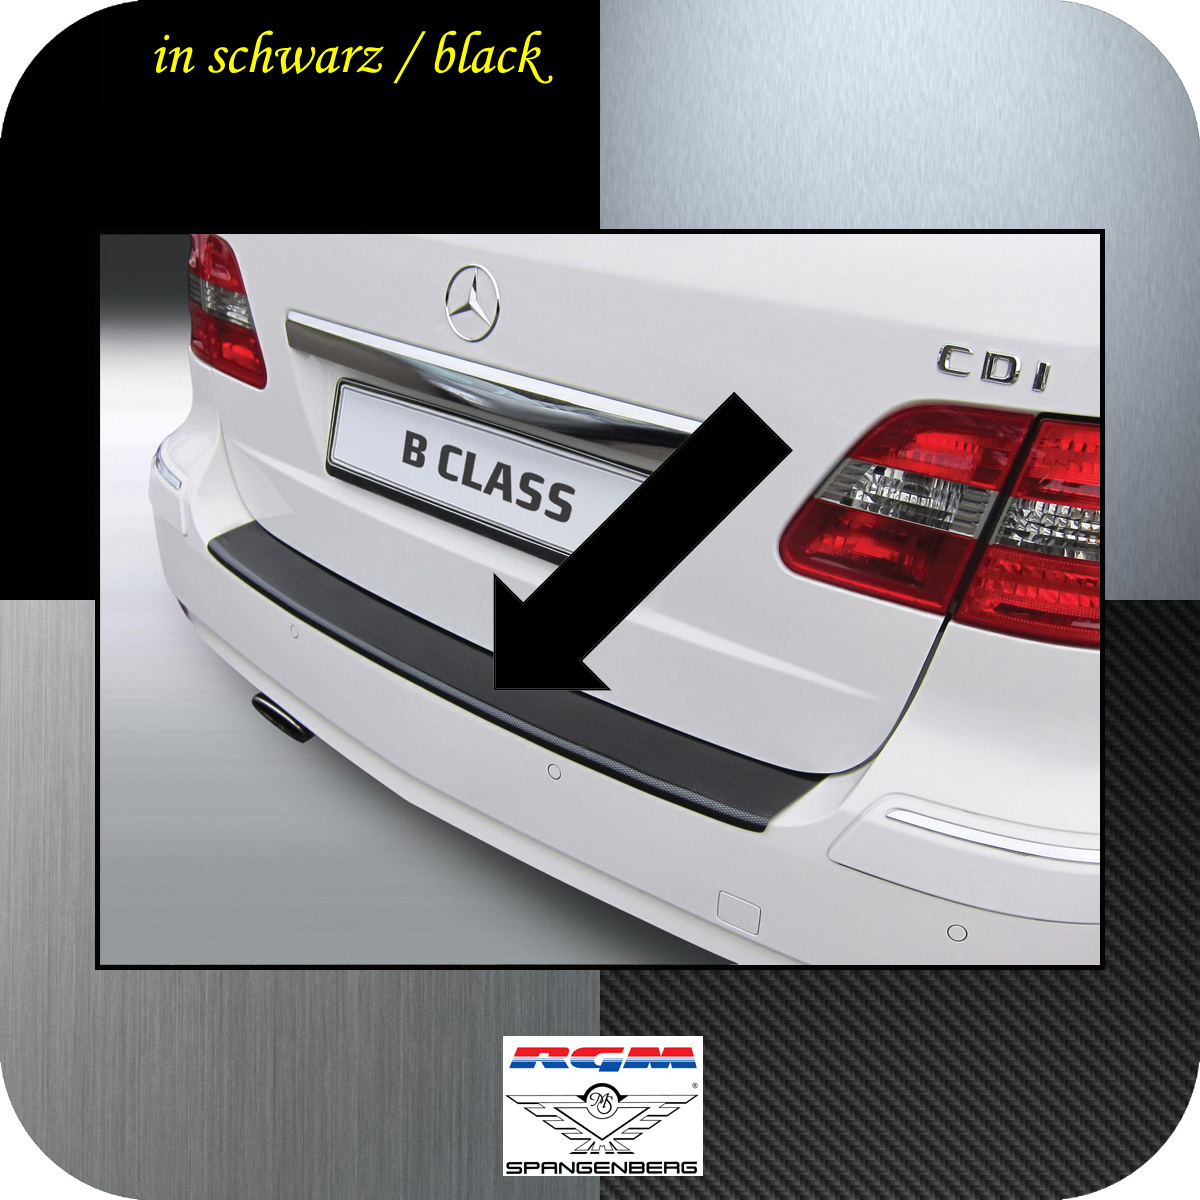 Ladekantenschutz schwarz Mercedes B-Klasse I T245 W245 2005-2011 3500308